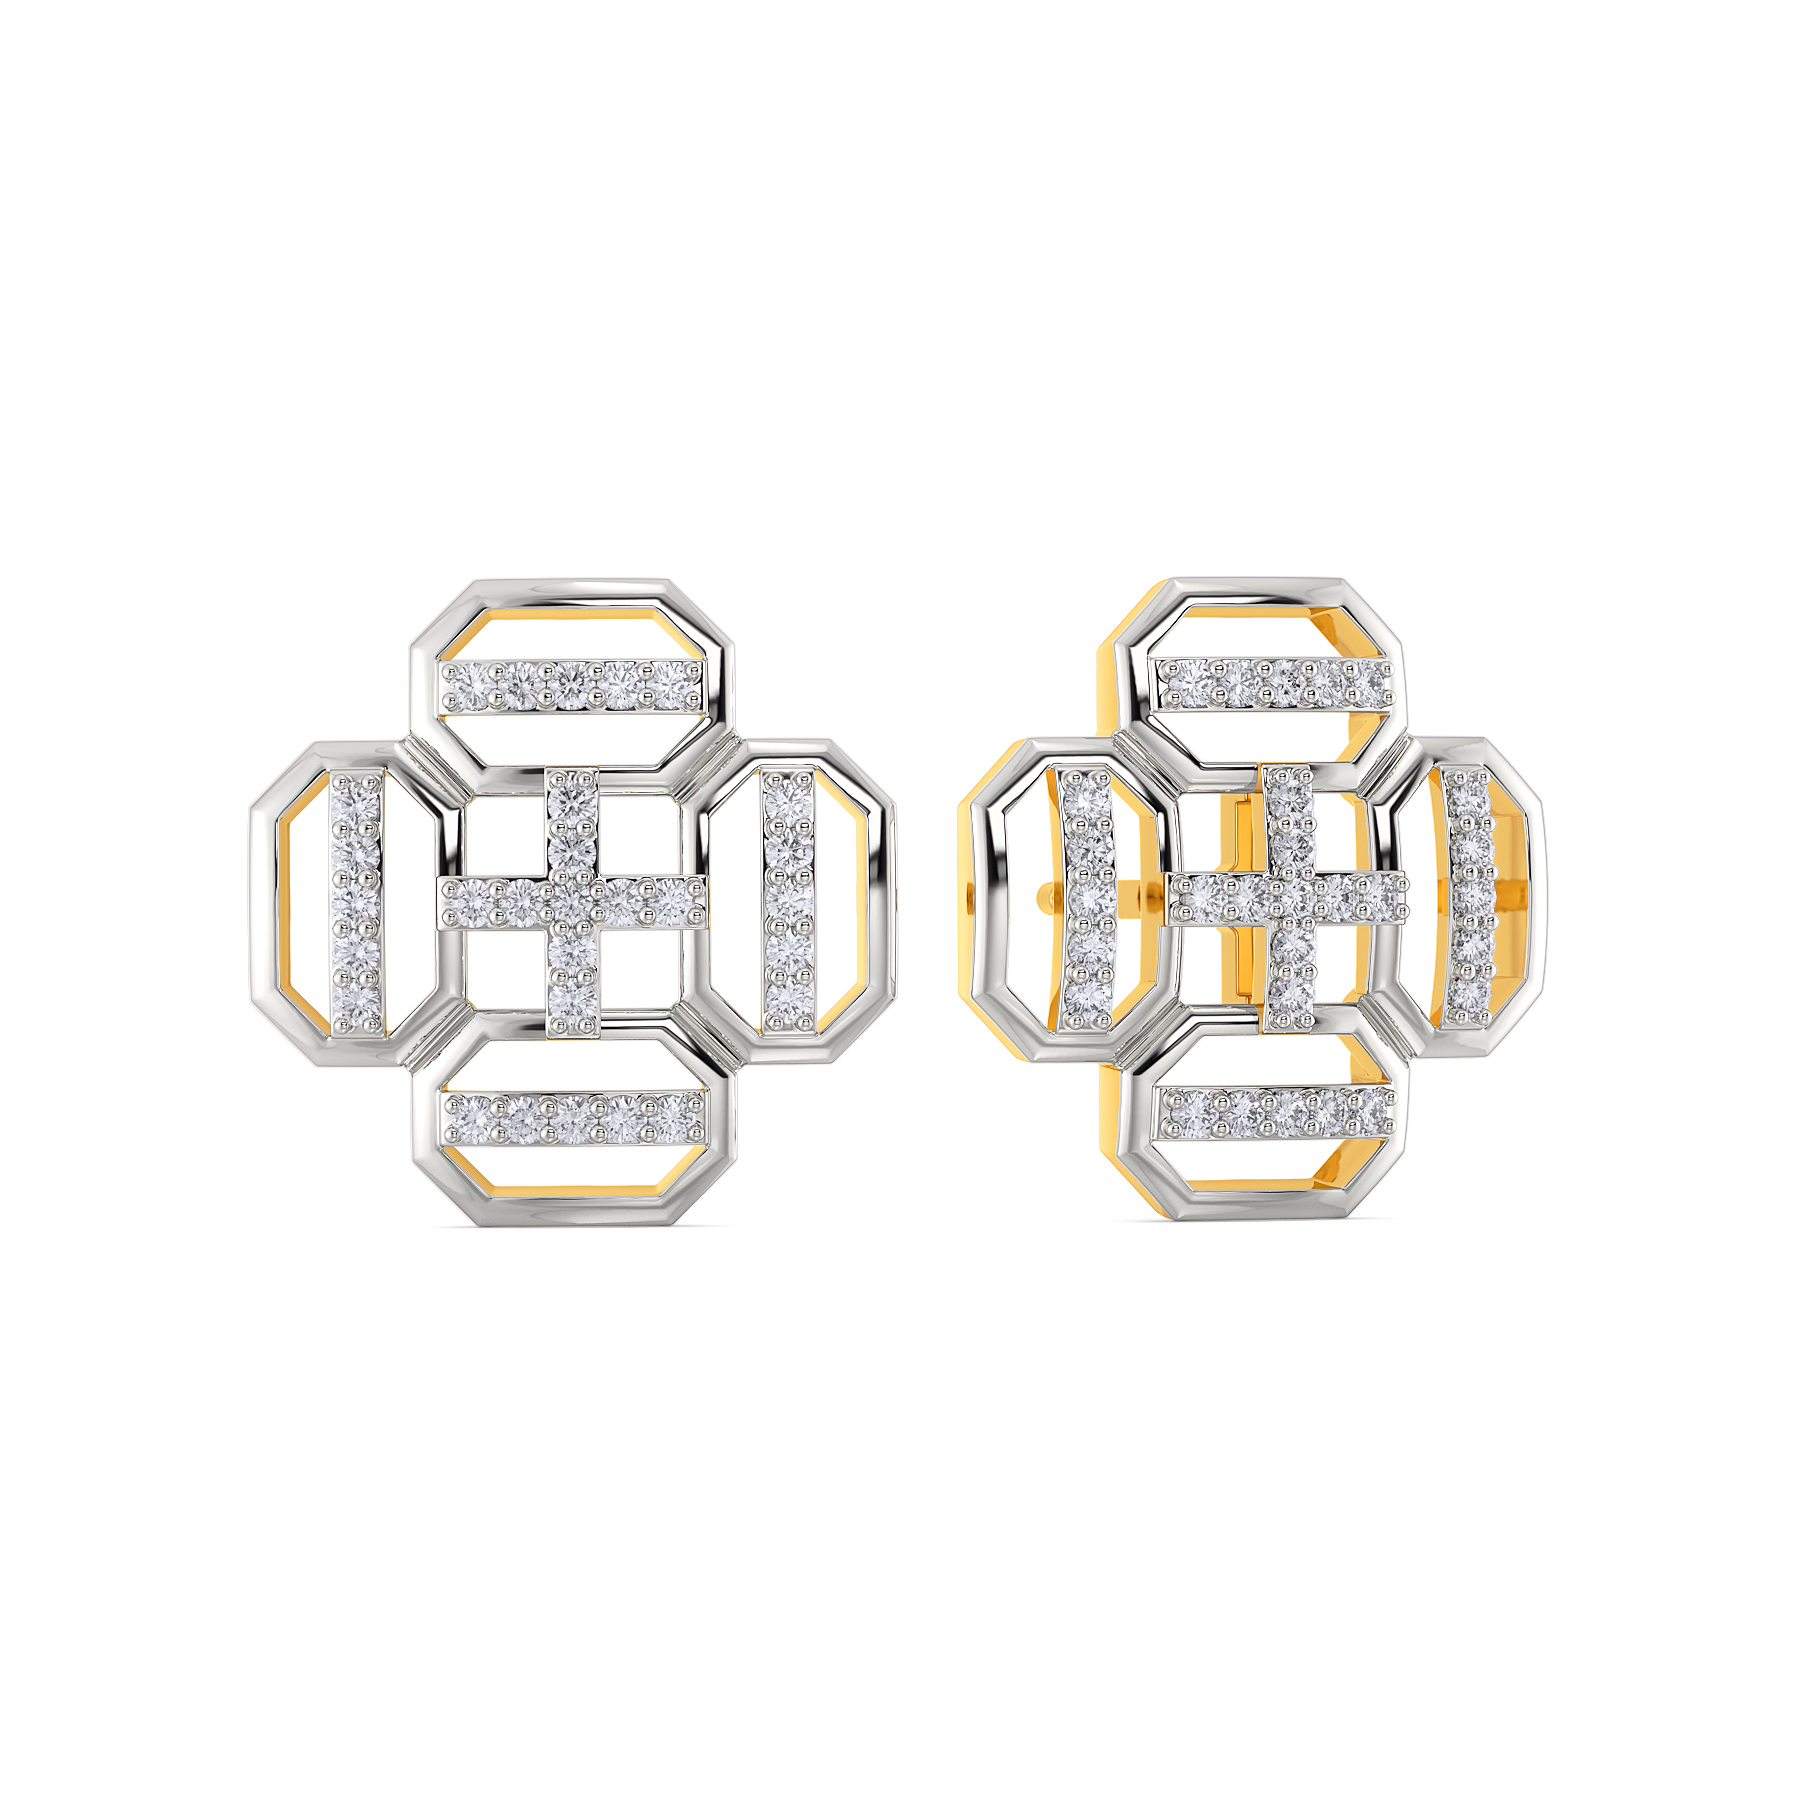 The Carryall Diamond Earrings